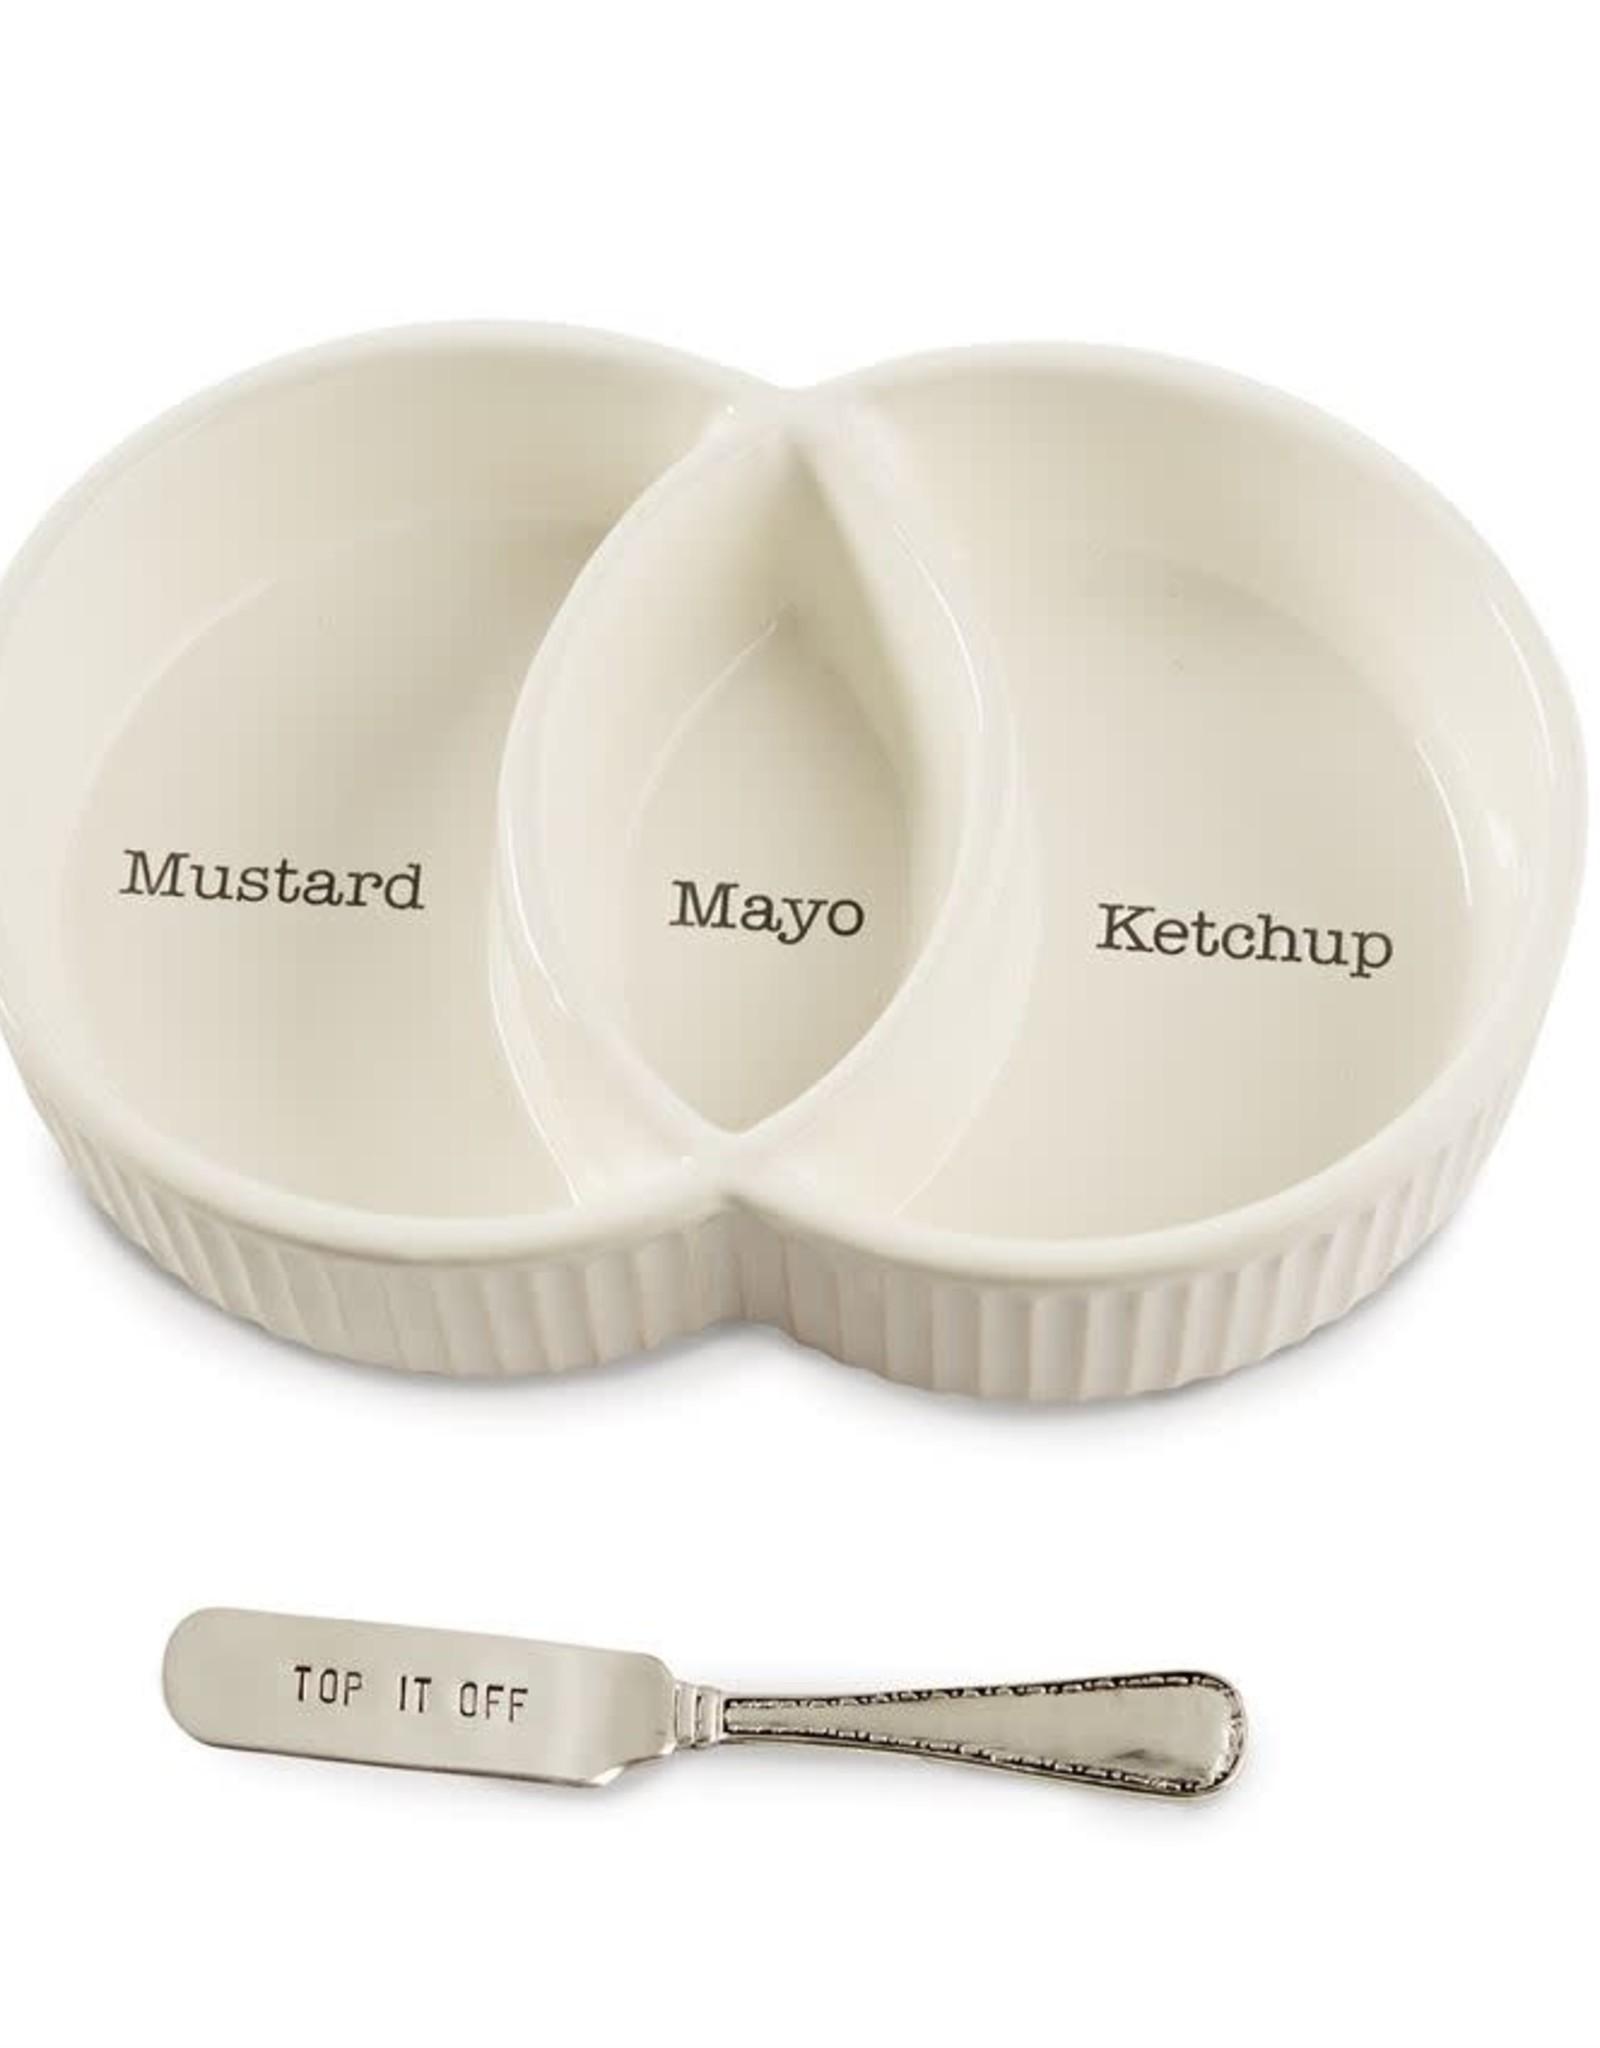 Mudpie Divided Condiment Bowl Set